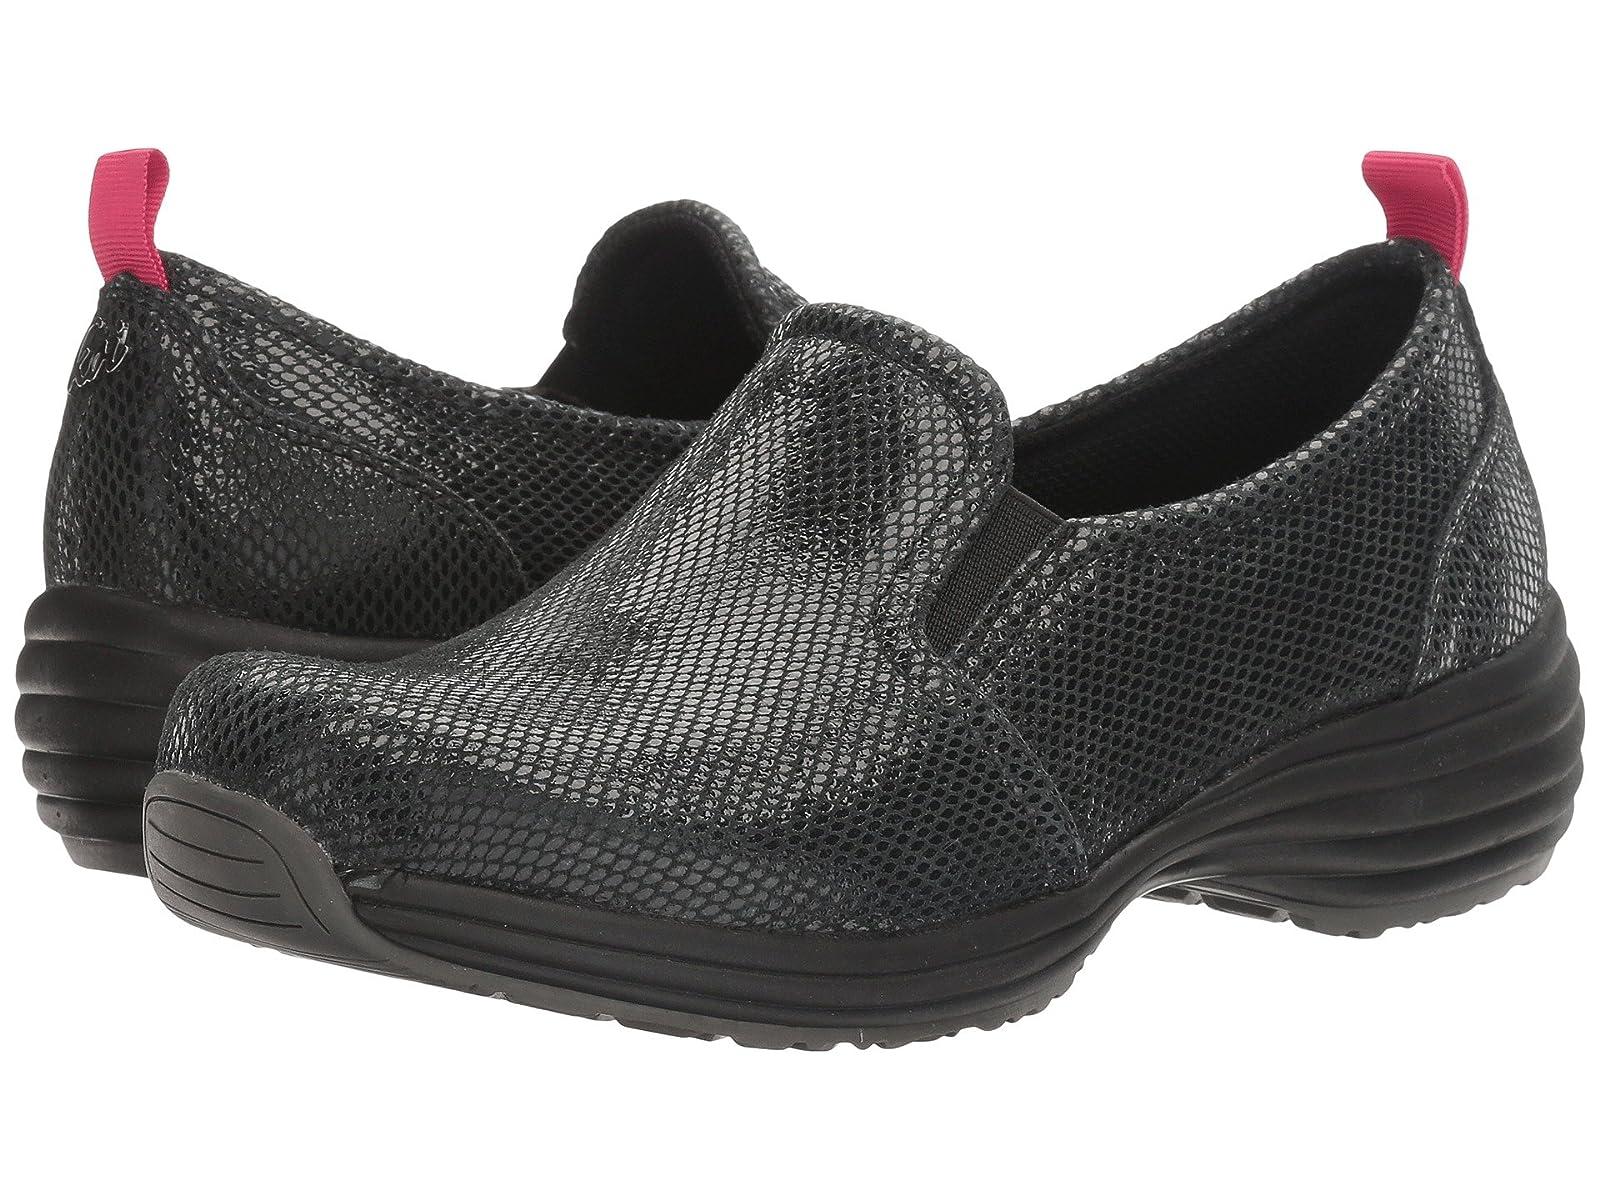 Sanita Laylah Koi LiteCheap and distinctive eye-catching shoes